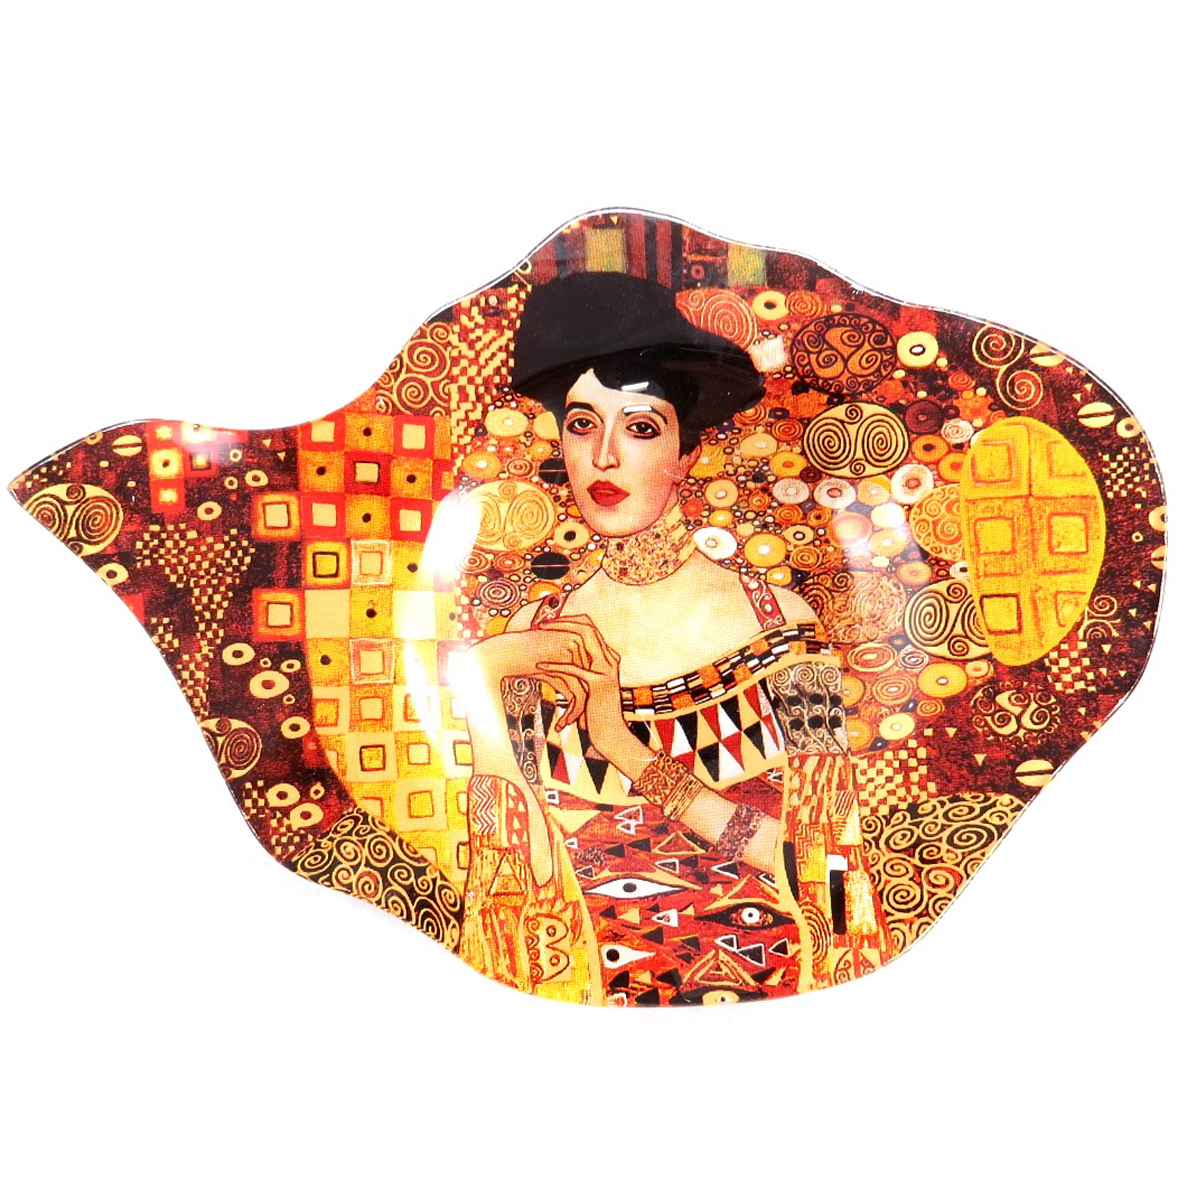 Repose sachets \'Gustav Klimt\' (Adele) - 14x95 cm - [Q0195]